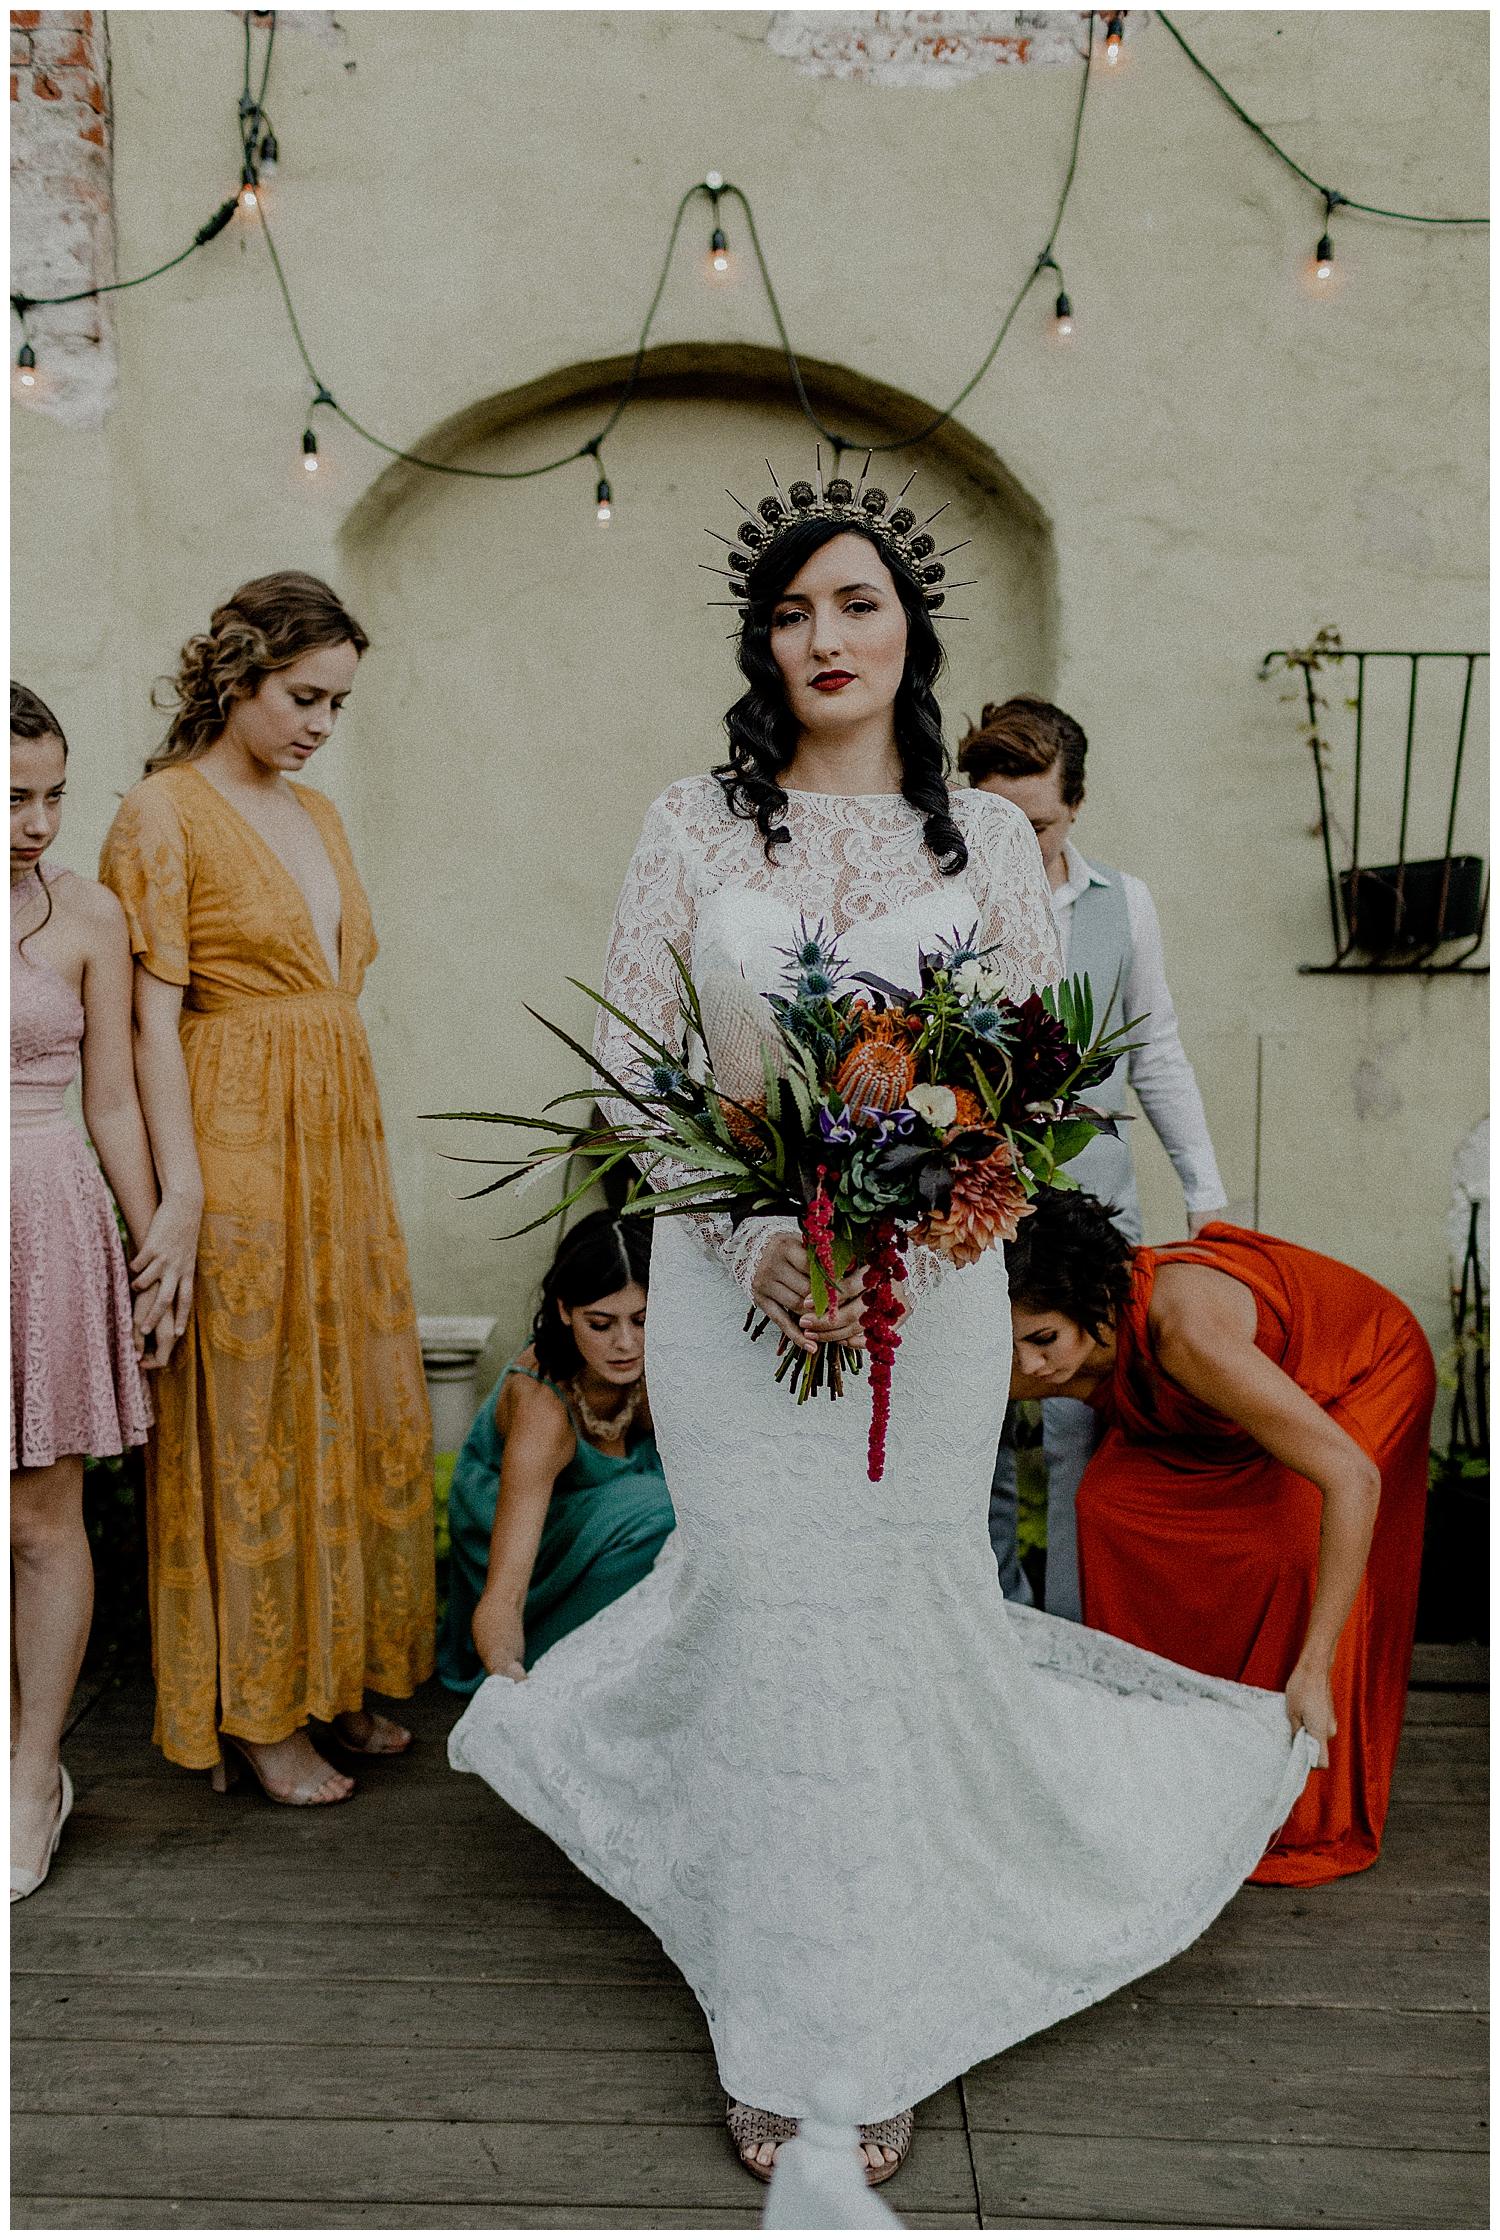 a boujee bride